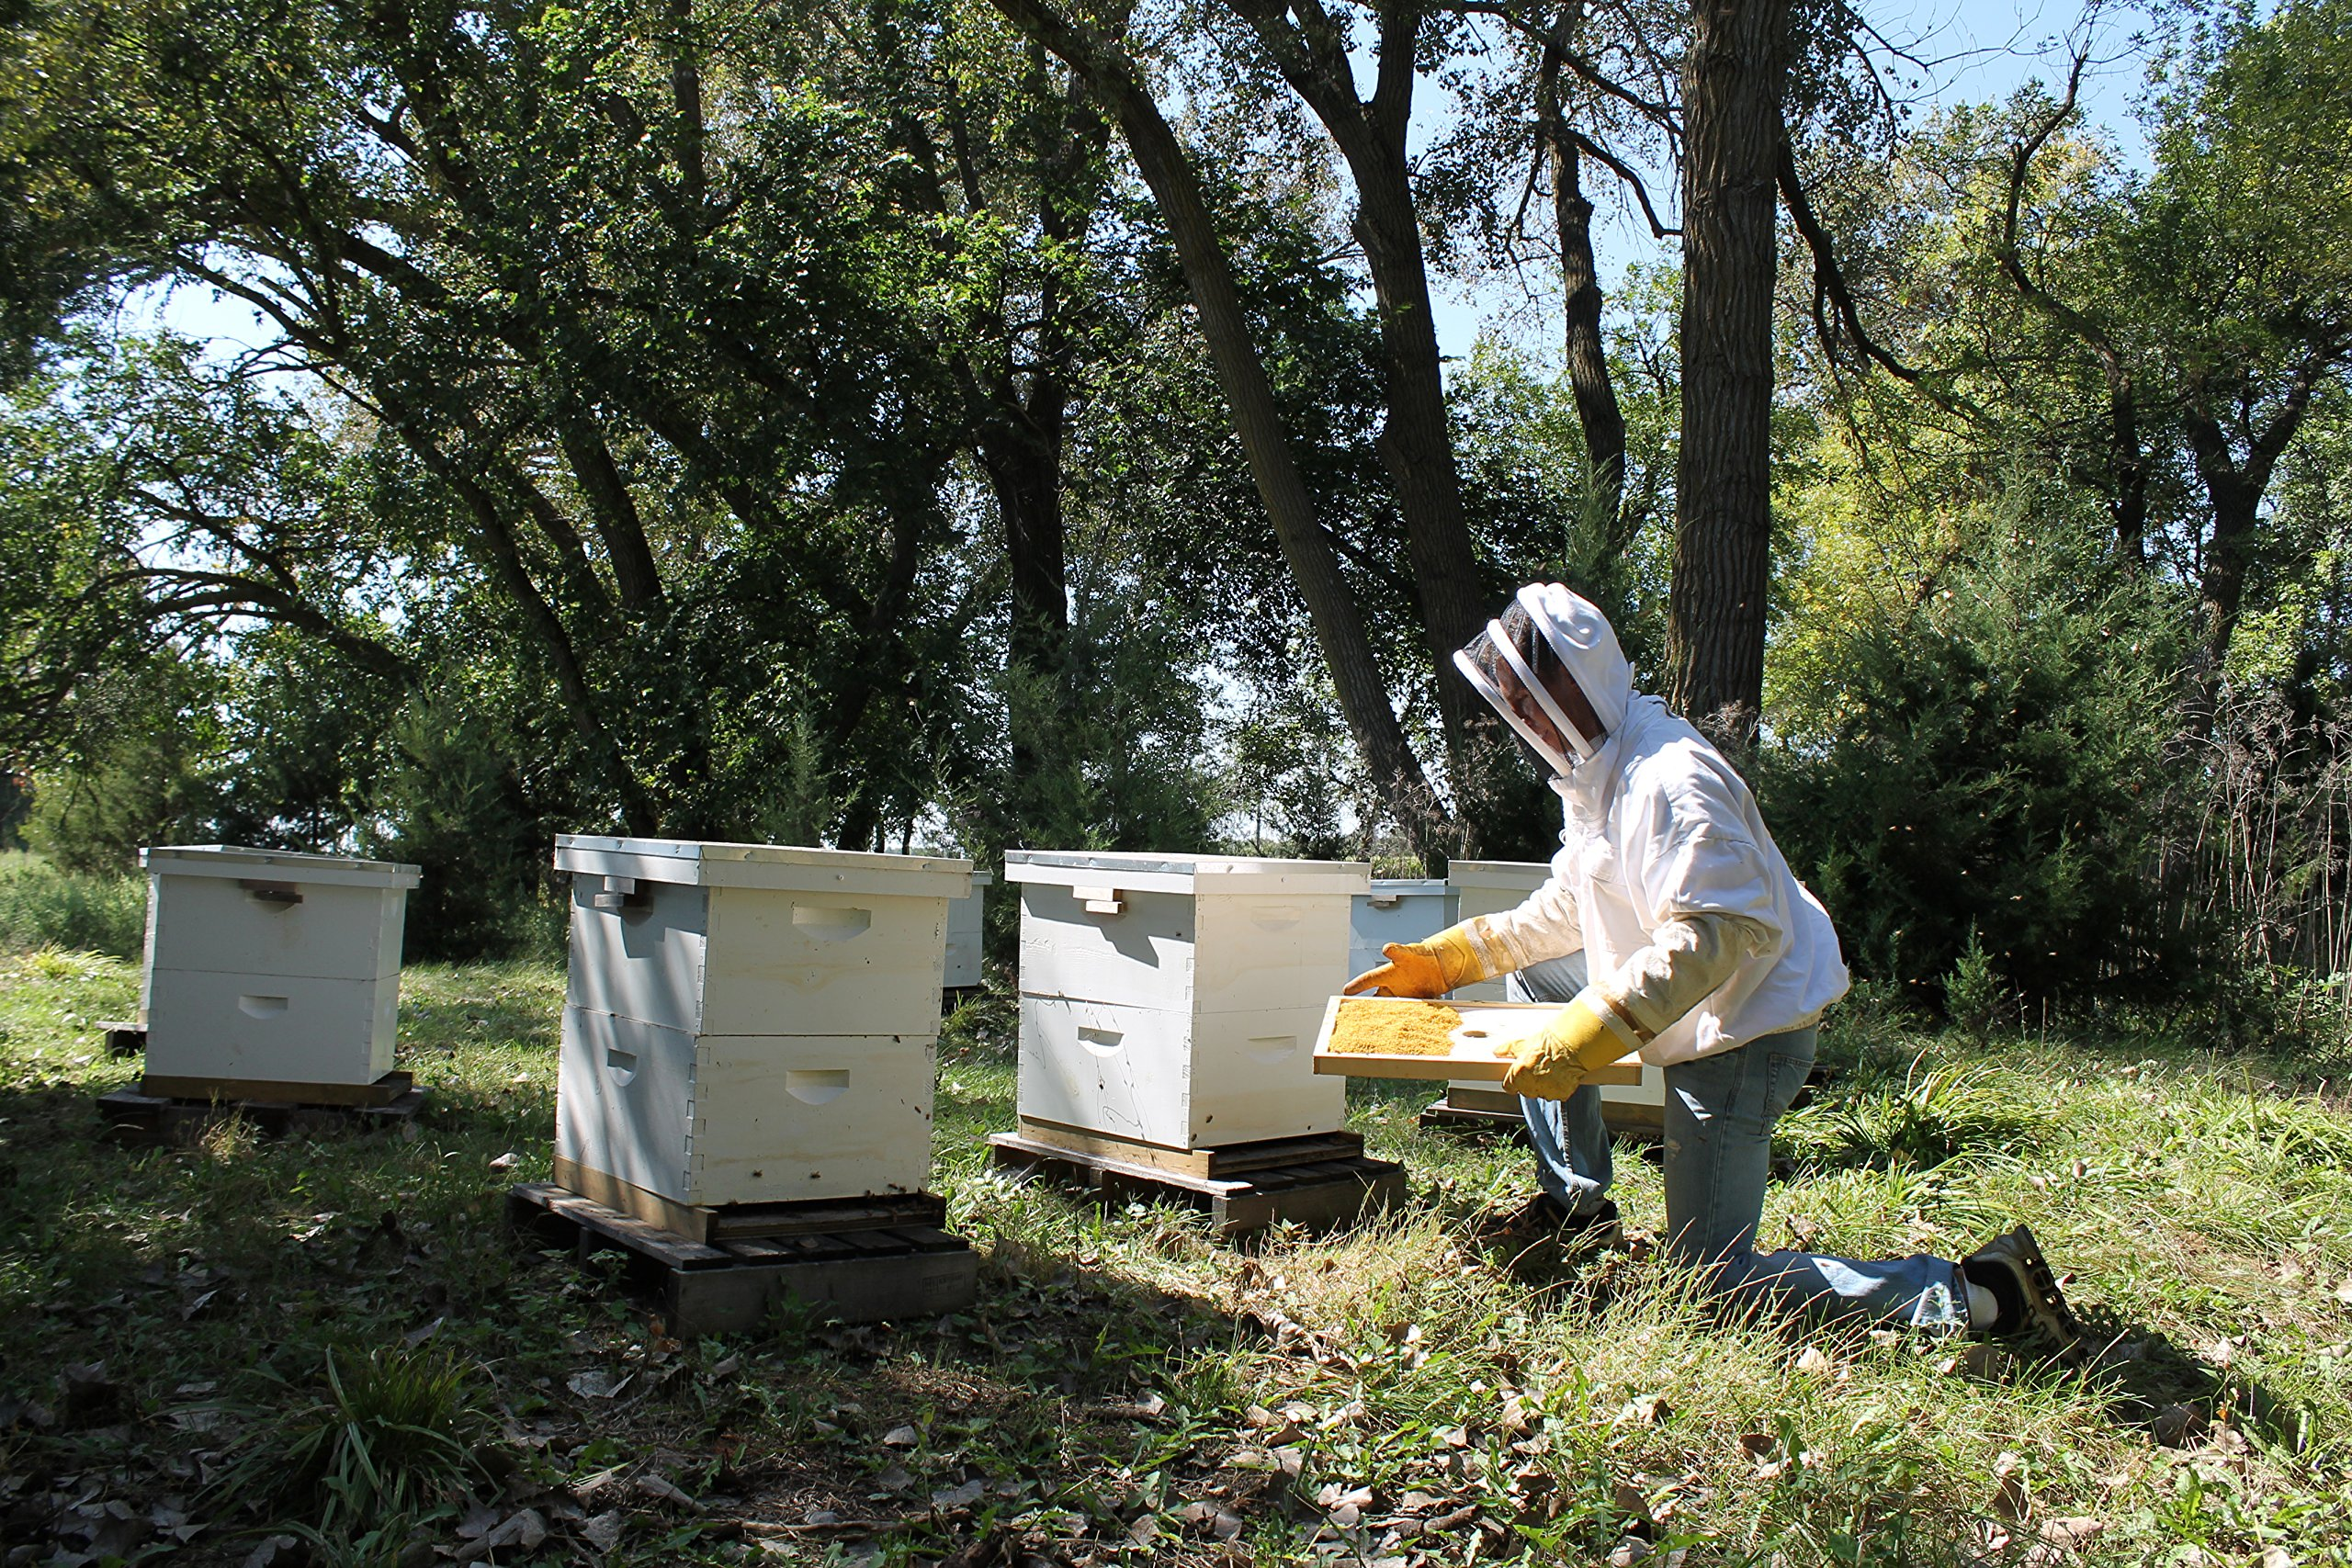 Raw Honey Pure Natural Nebraska Honey One 2lb Jar by Prairie River Honey Farm (Image #8)